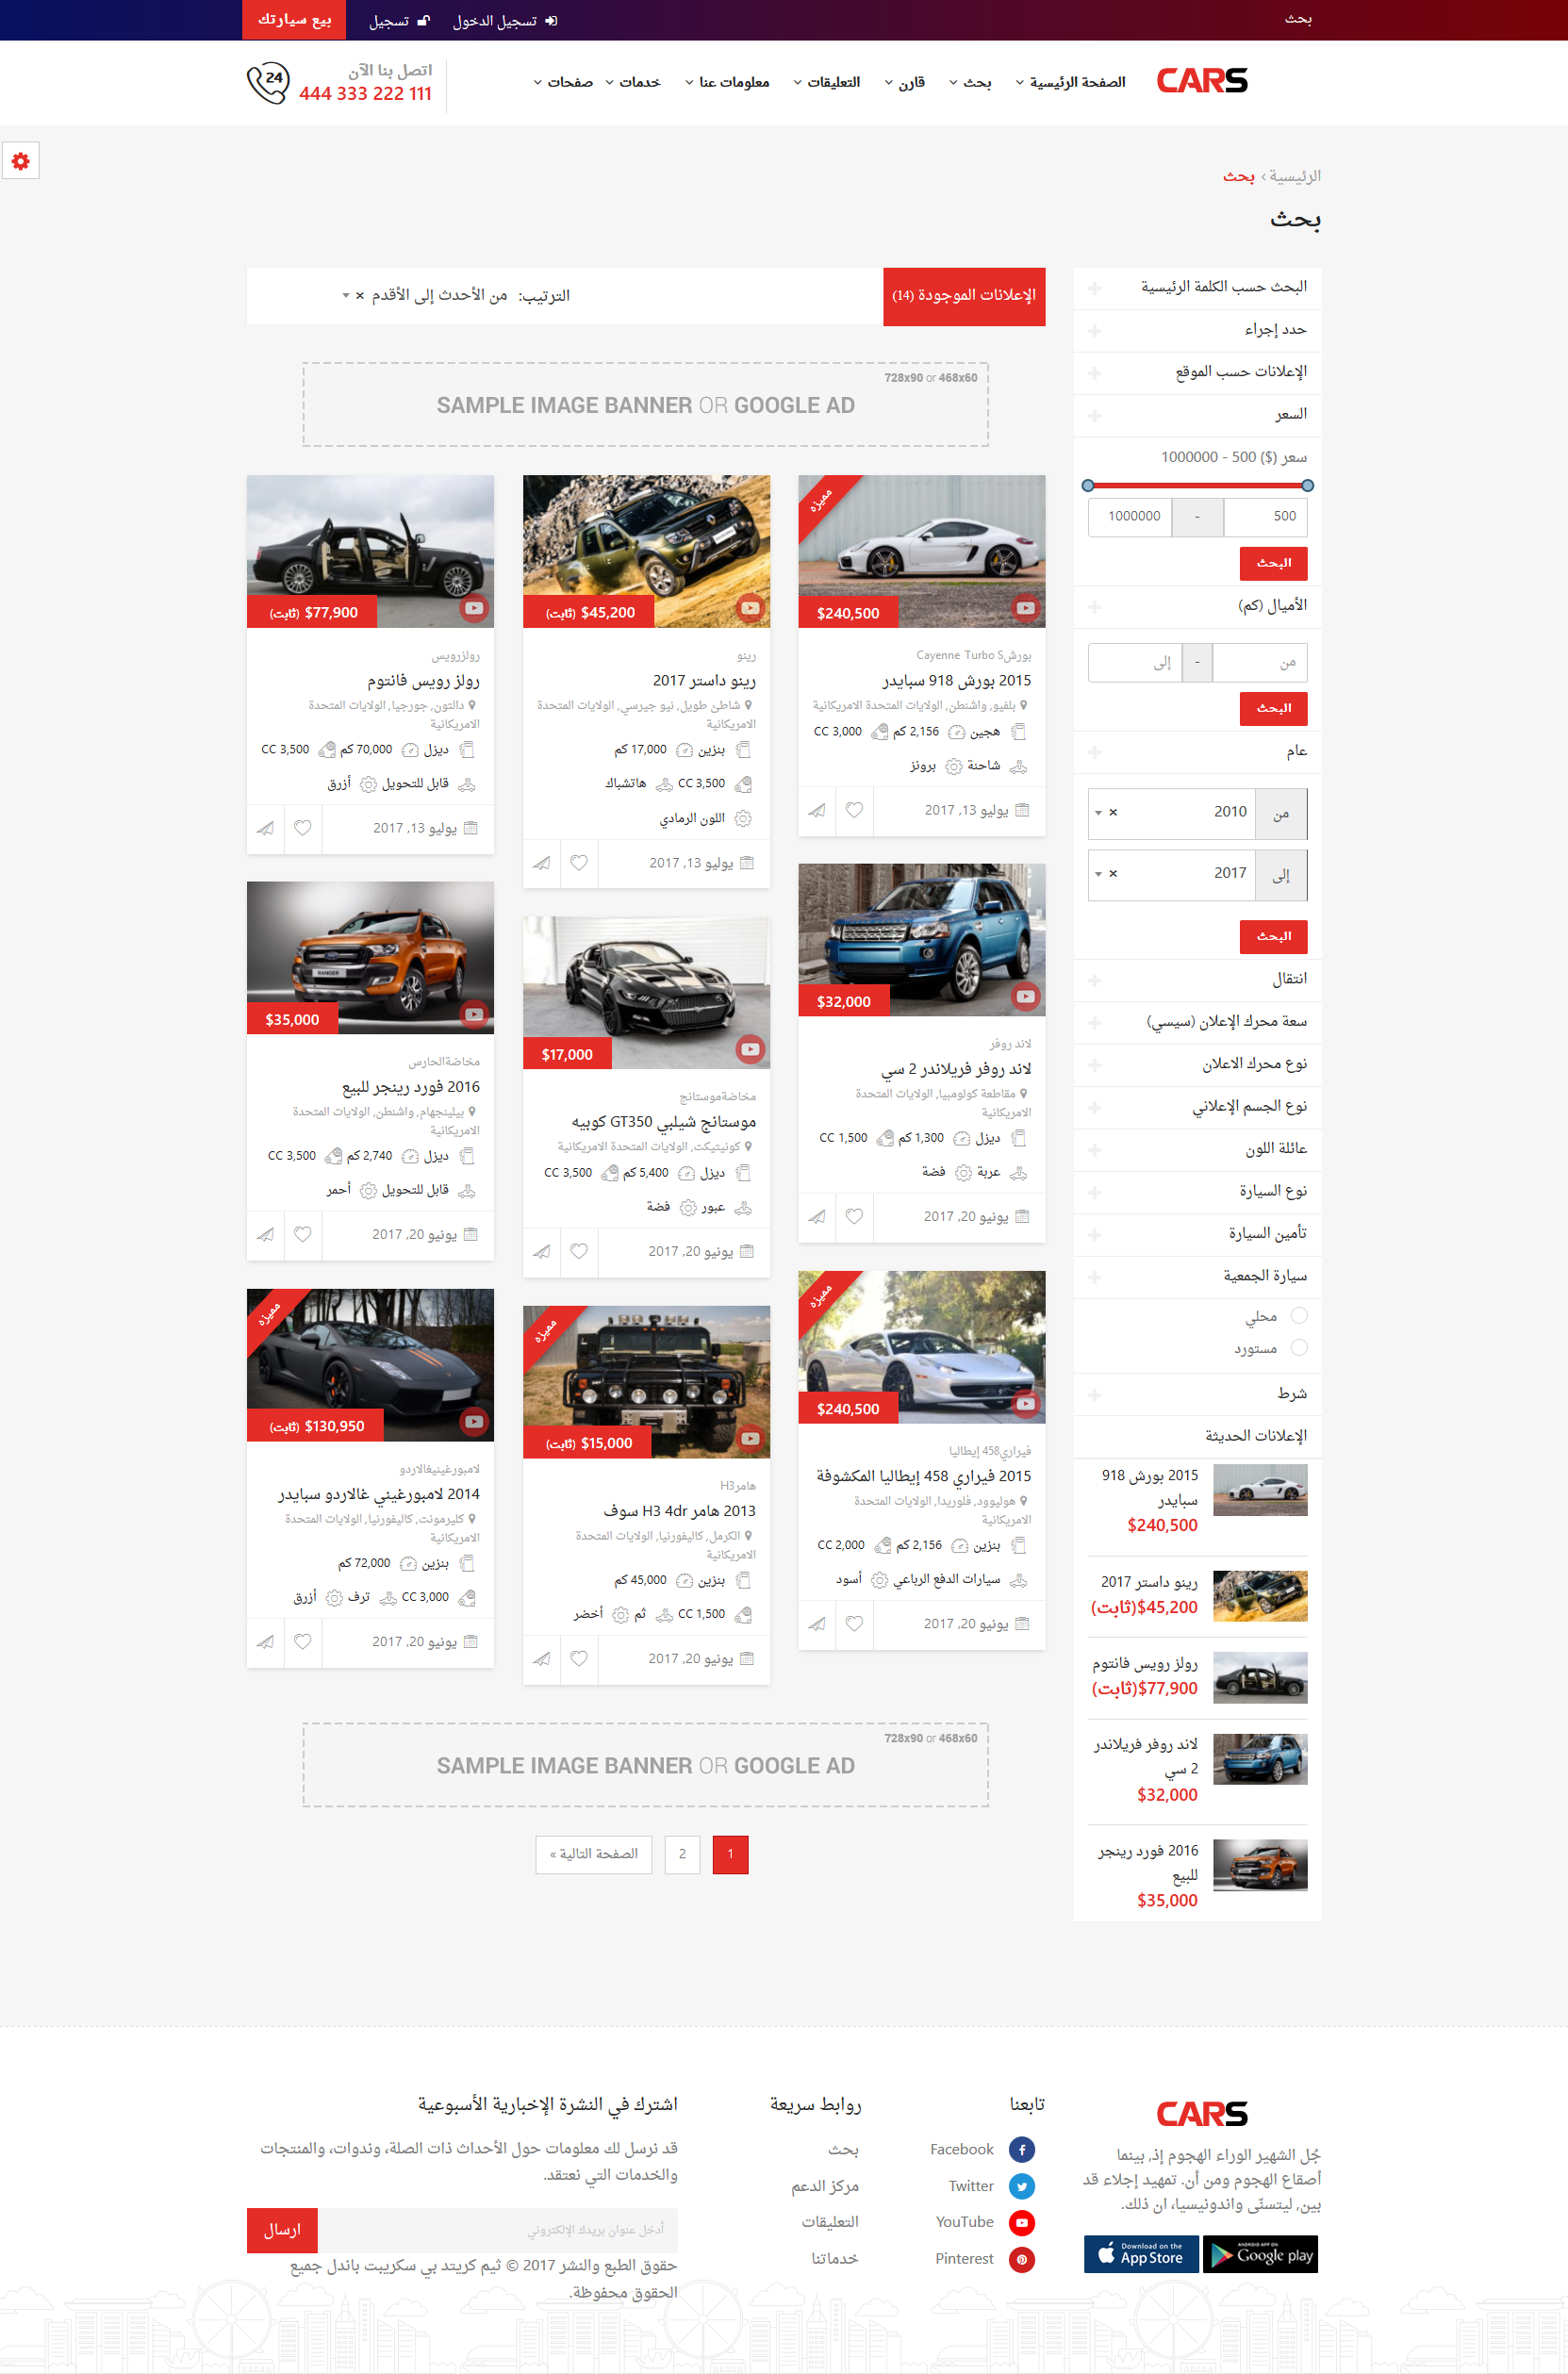 f4c0a8c55 تصميم برنامج موقع حراج معارض سيارات - صفحة البحث عن عروض سيارات للبيع  والشراء